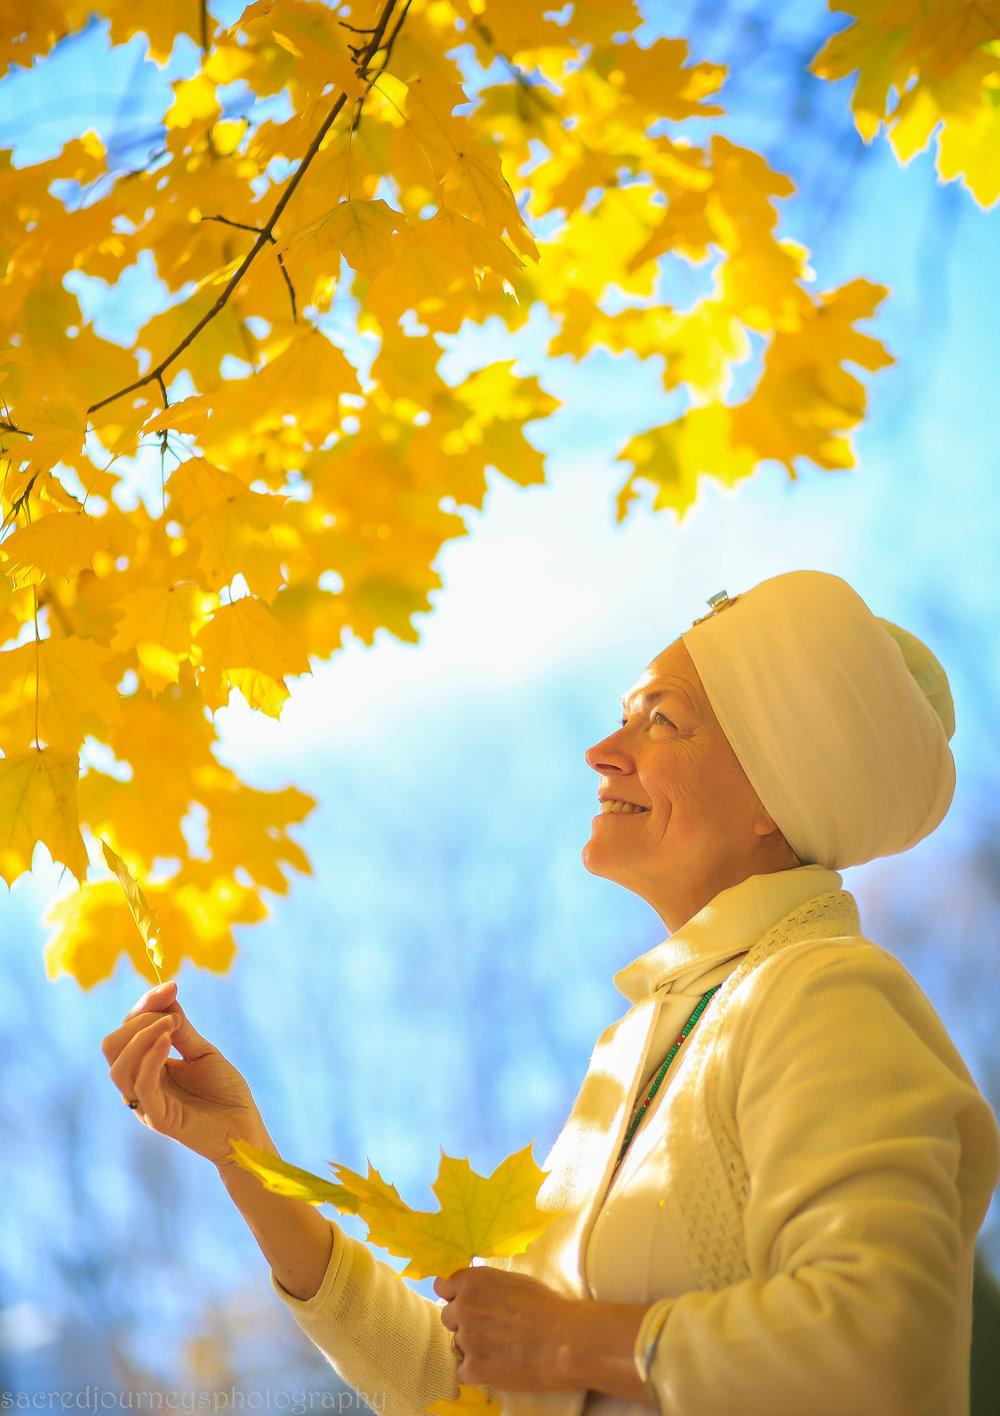 Nirbhe Kaur Autumn leaves November 2016 098.jpg